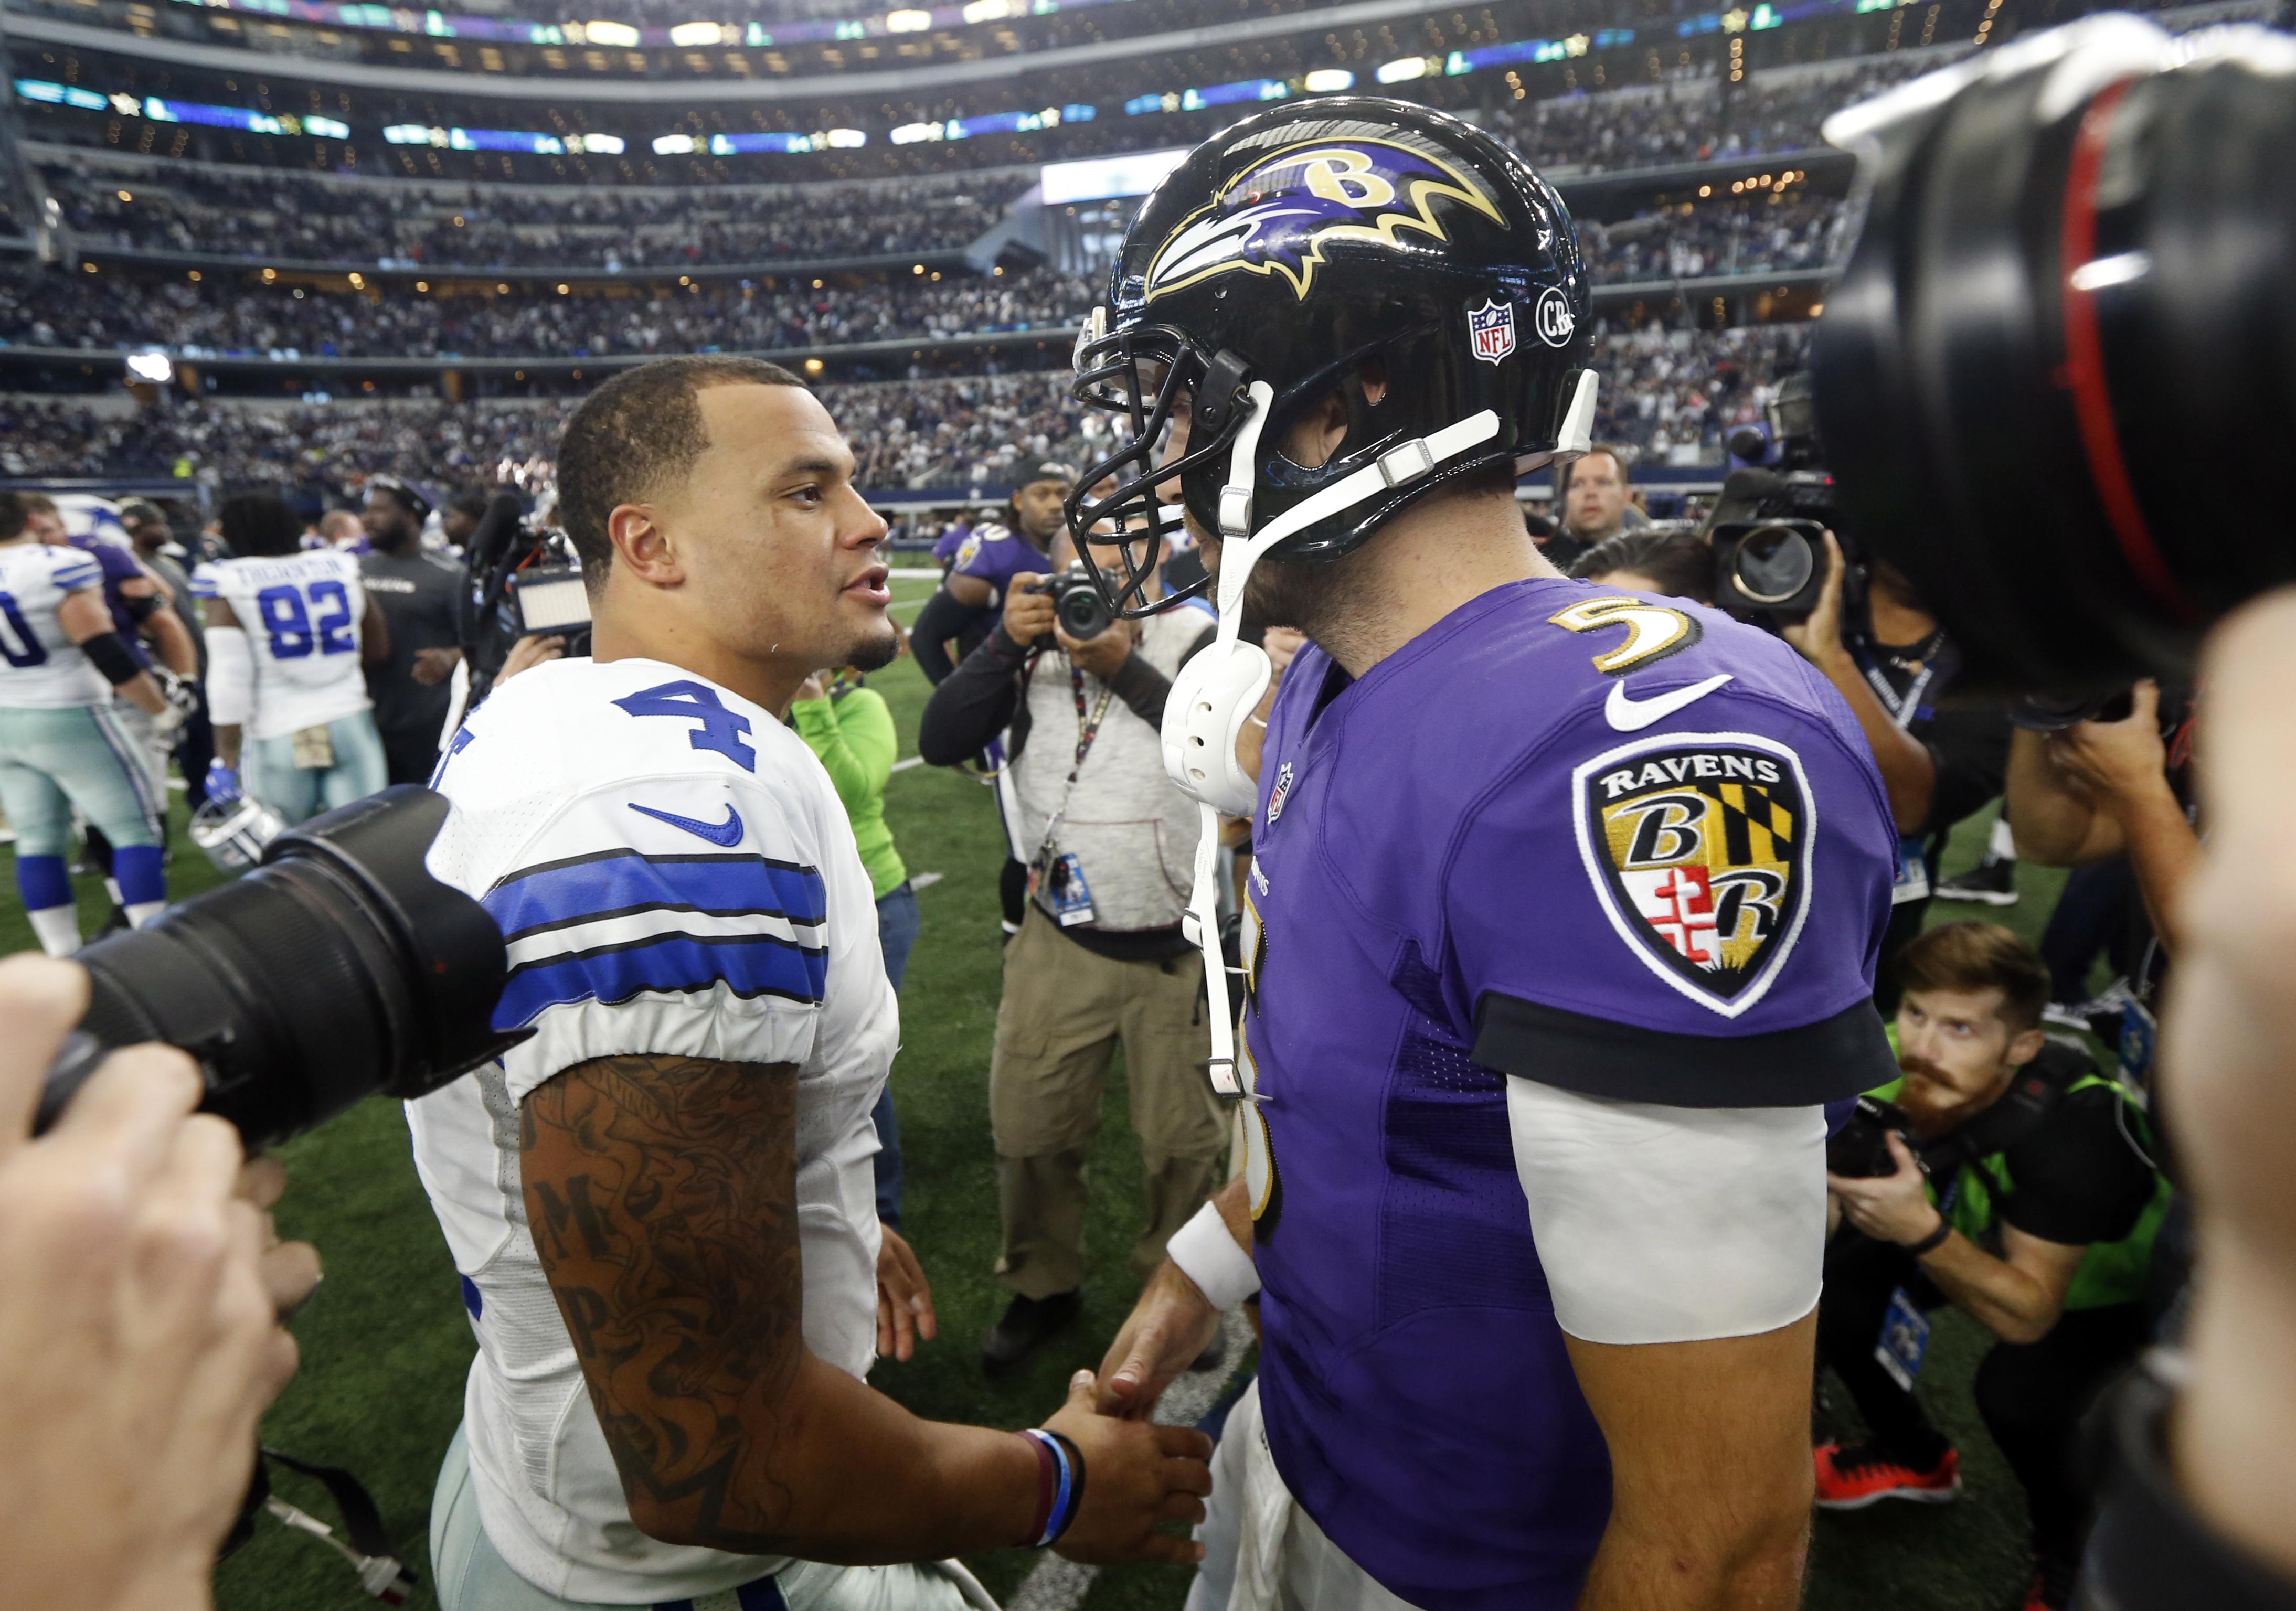 Dallas Cowboys quarterback Dak Prescott (4) and Baltimore Ravens quarterback Joe Flacco (5) greet each other after their NFL football game, Sunday, Nov. 20, 2016, in Arlington, Texas. (AP Photo/Michael Ainsworth)